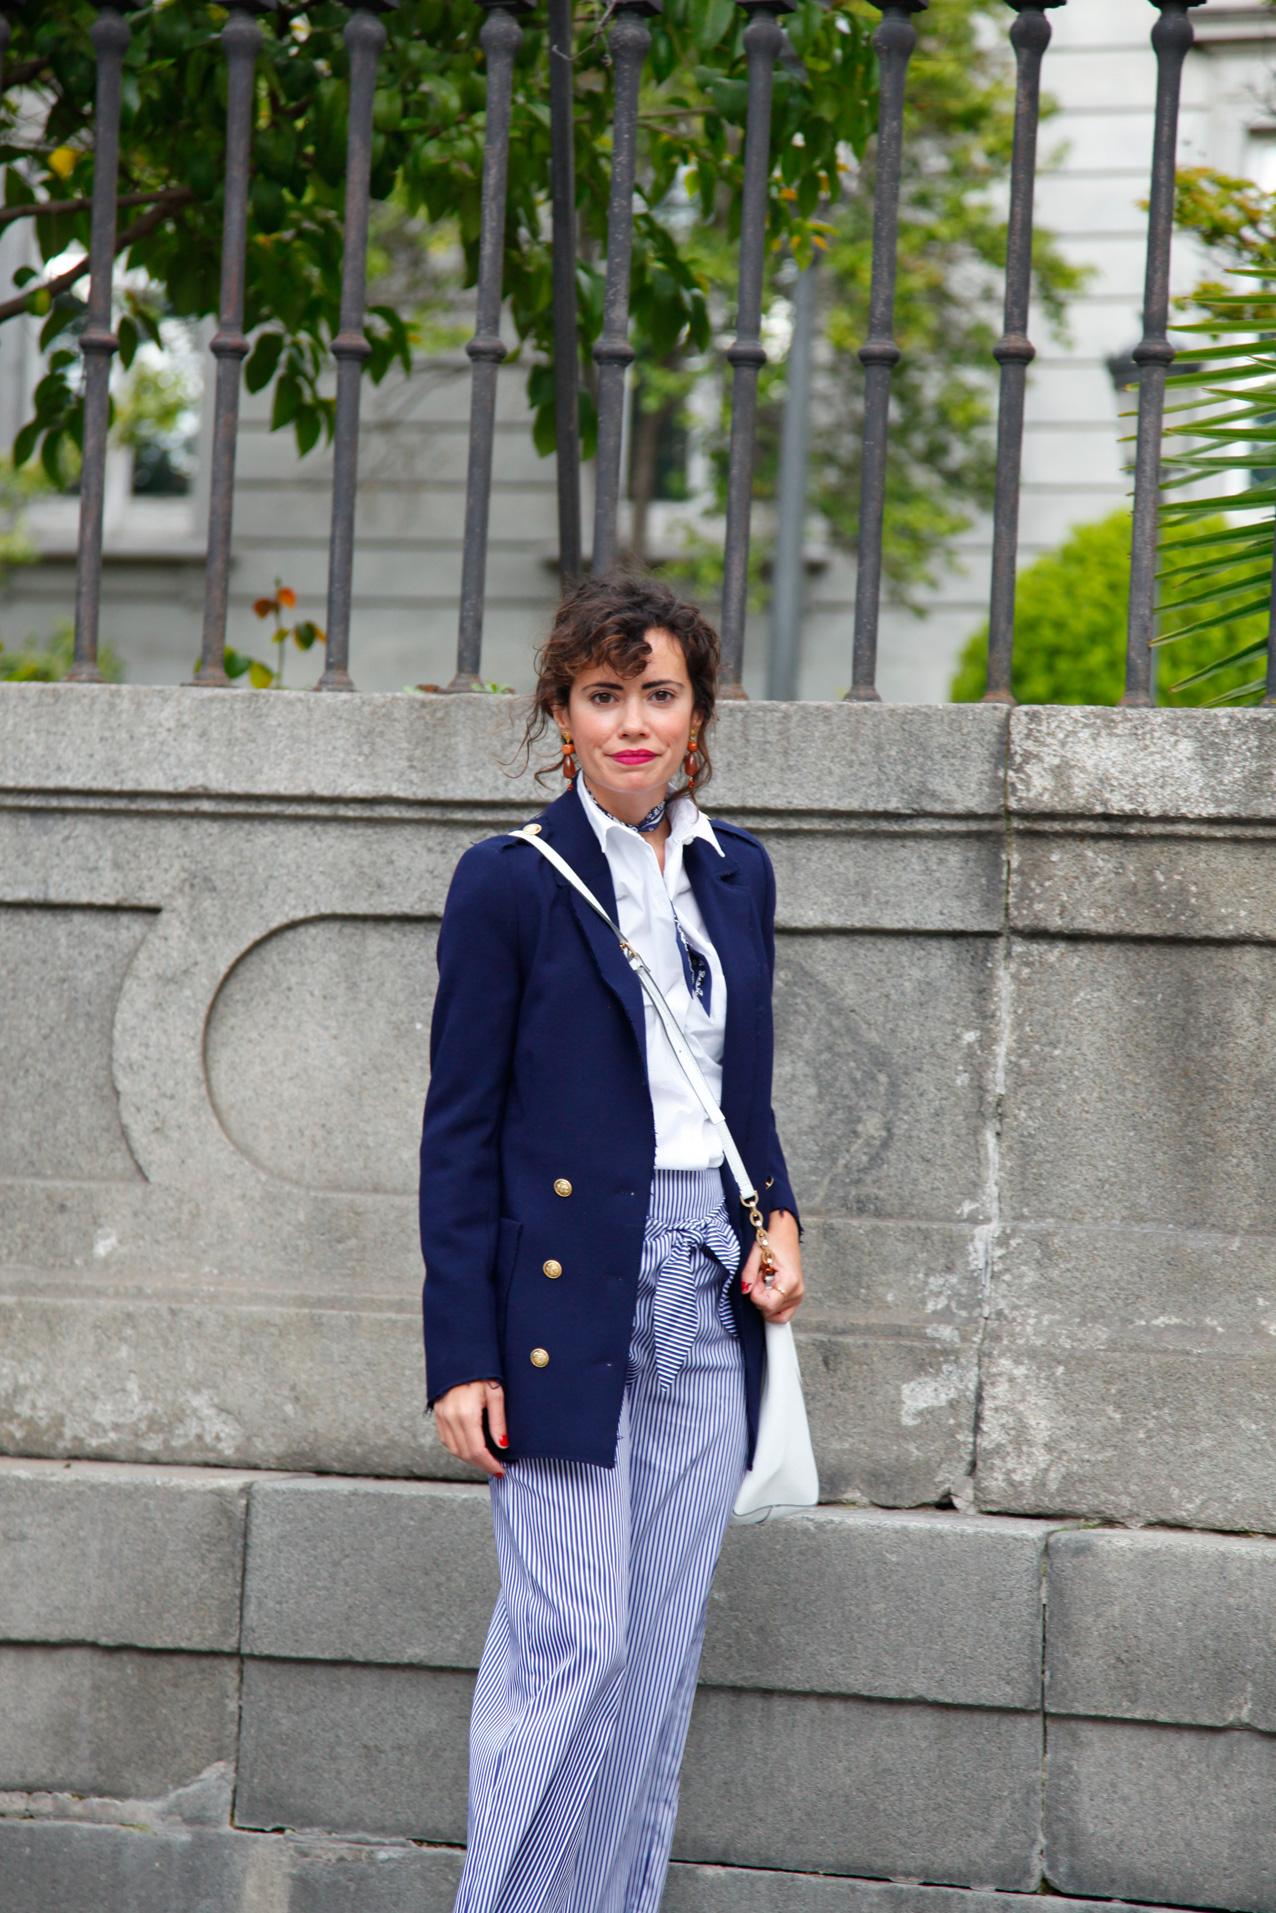 sailor_look-streetstyle-cool_lemonade